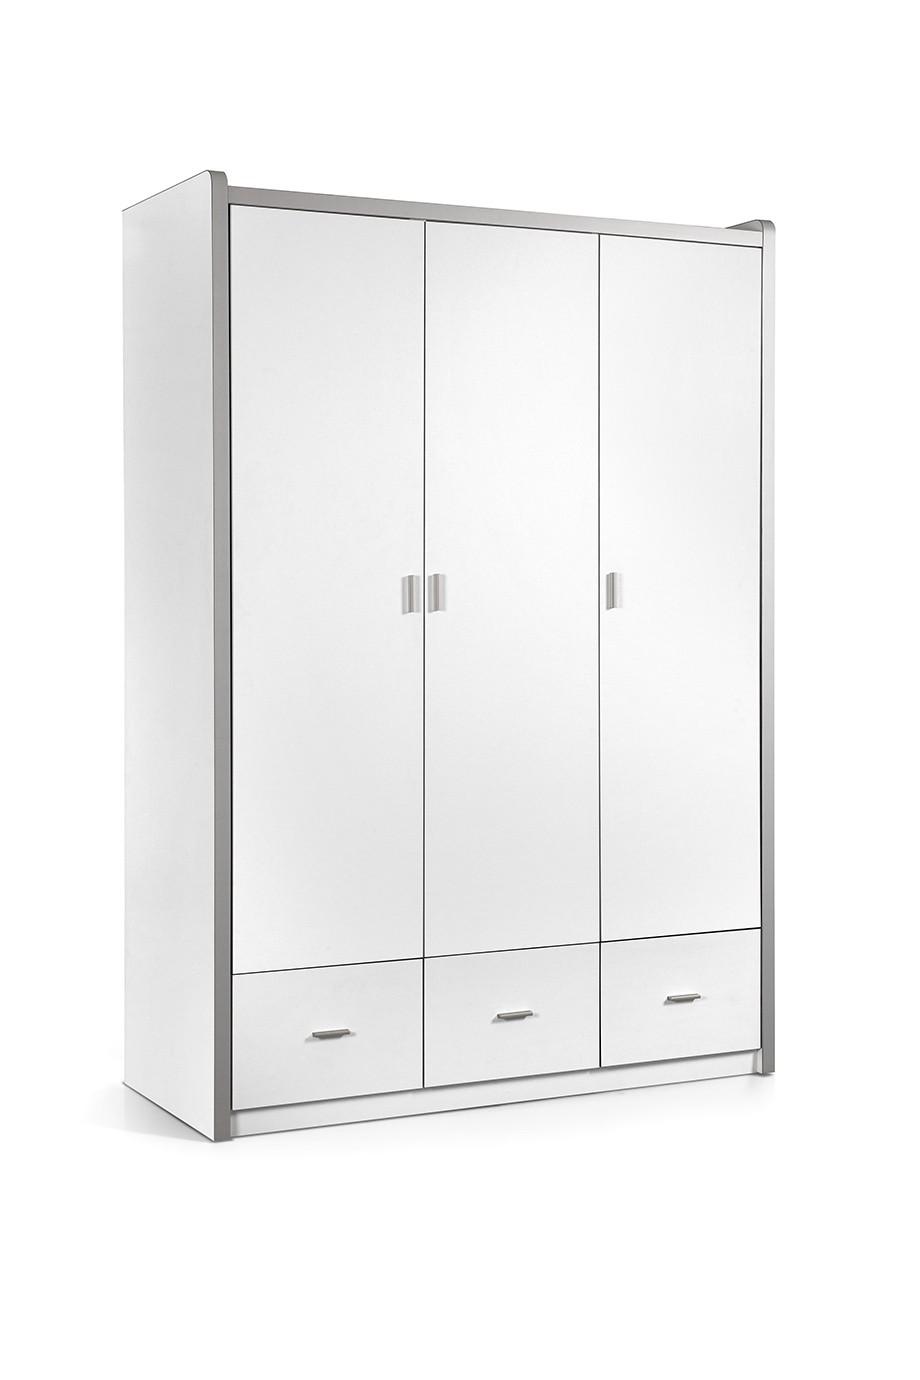 Bonny 3 deurs kledingkast wit